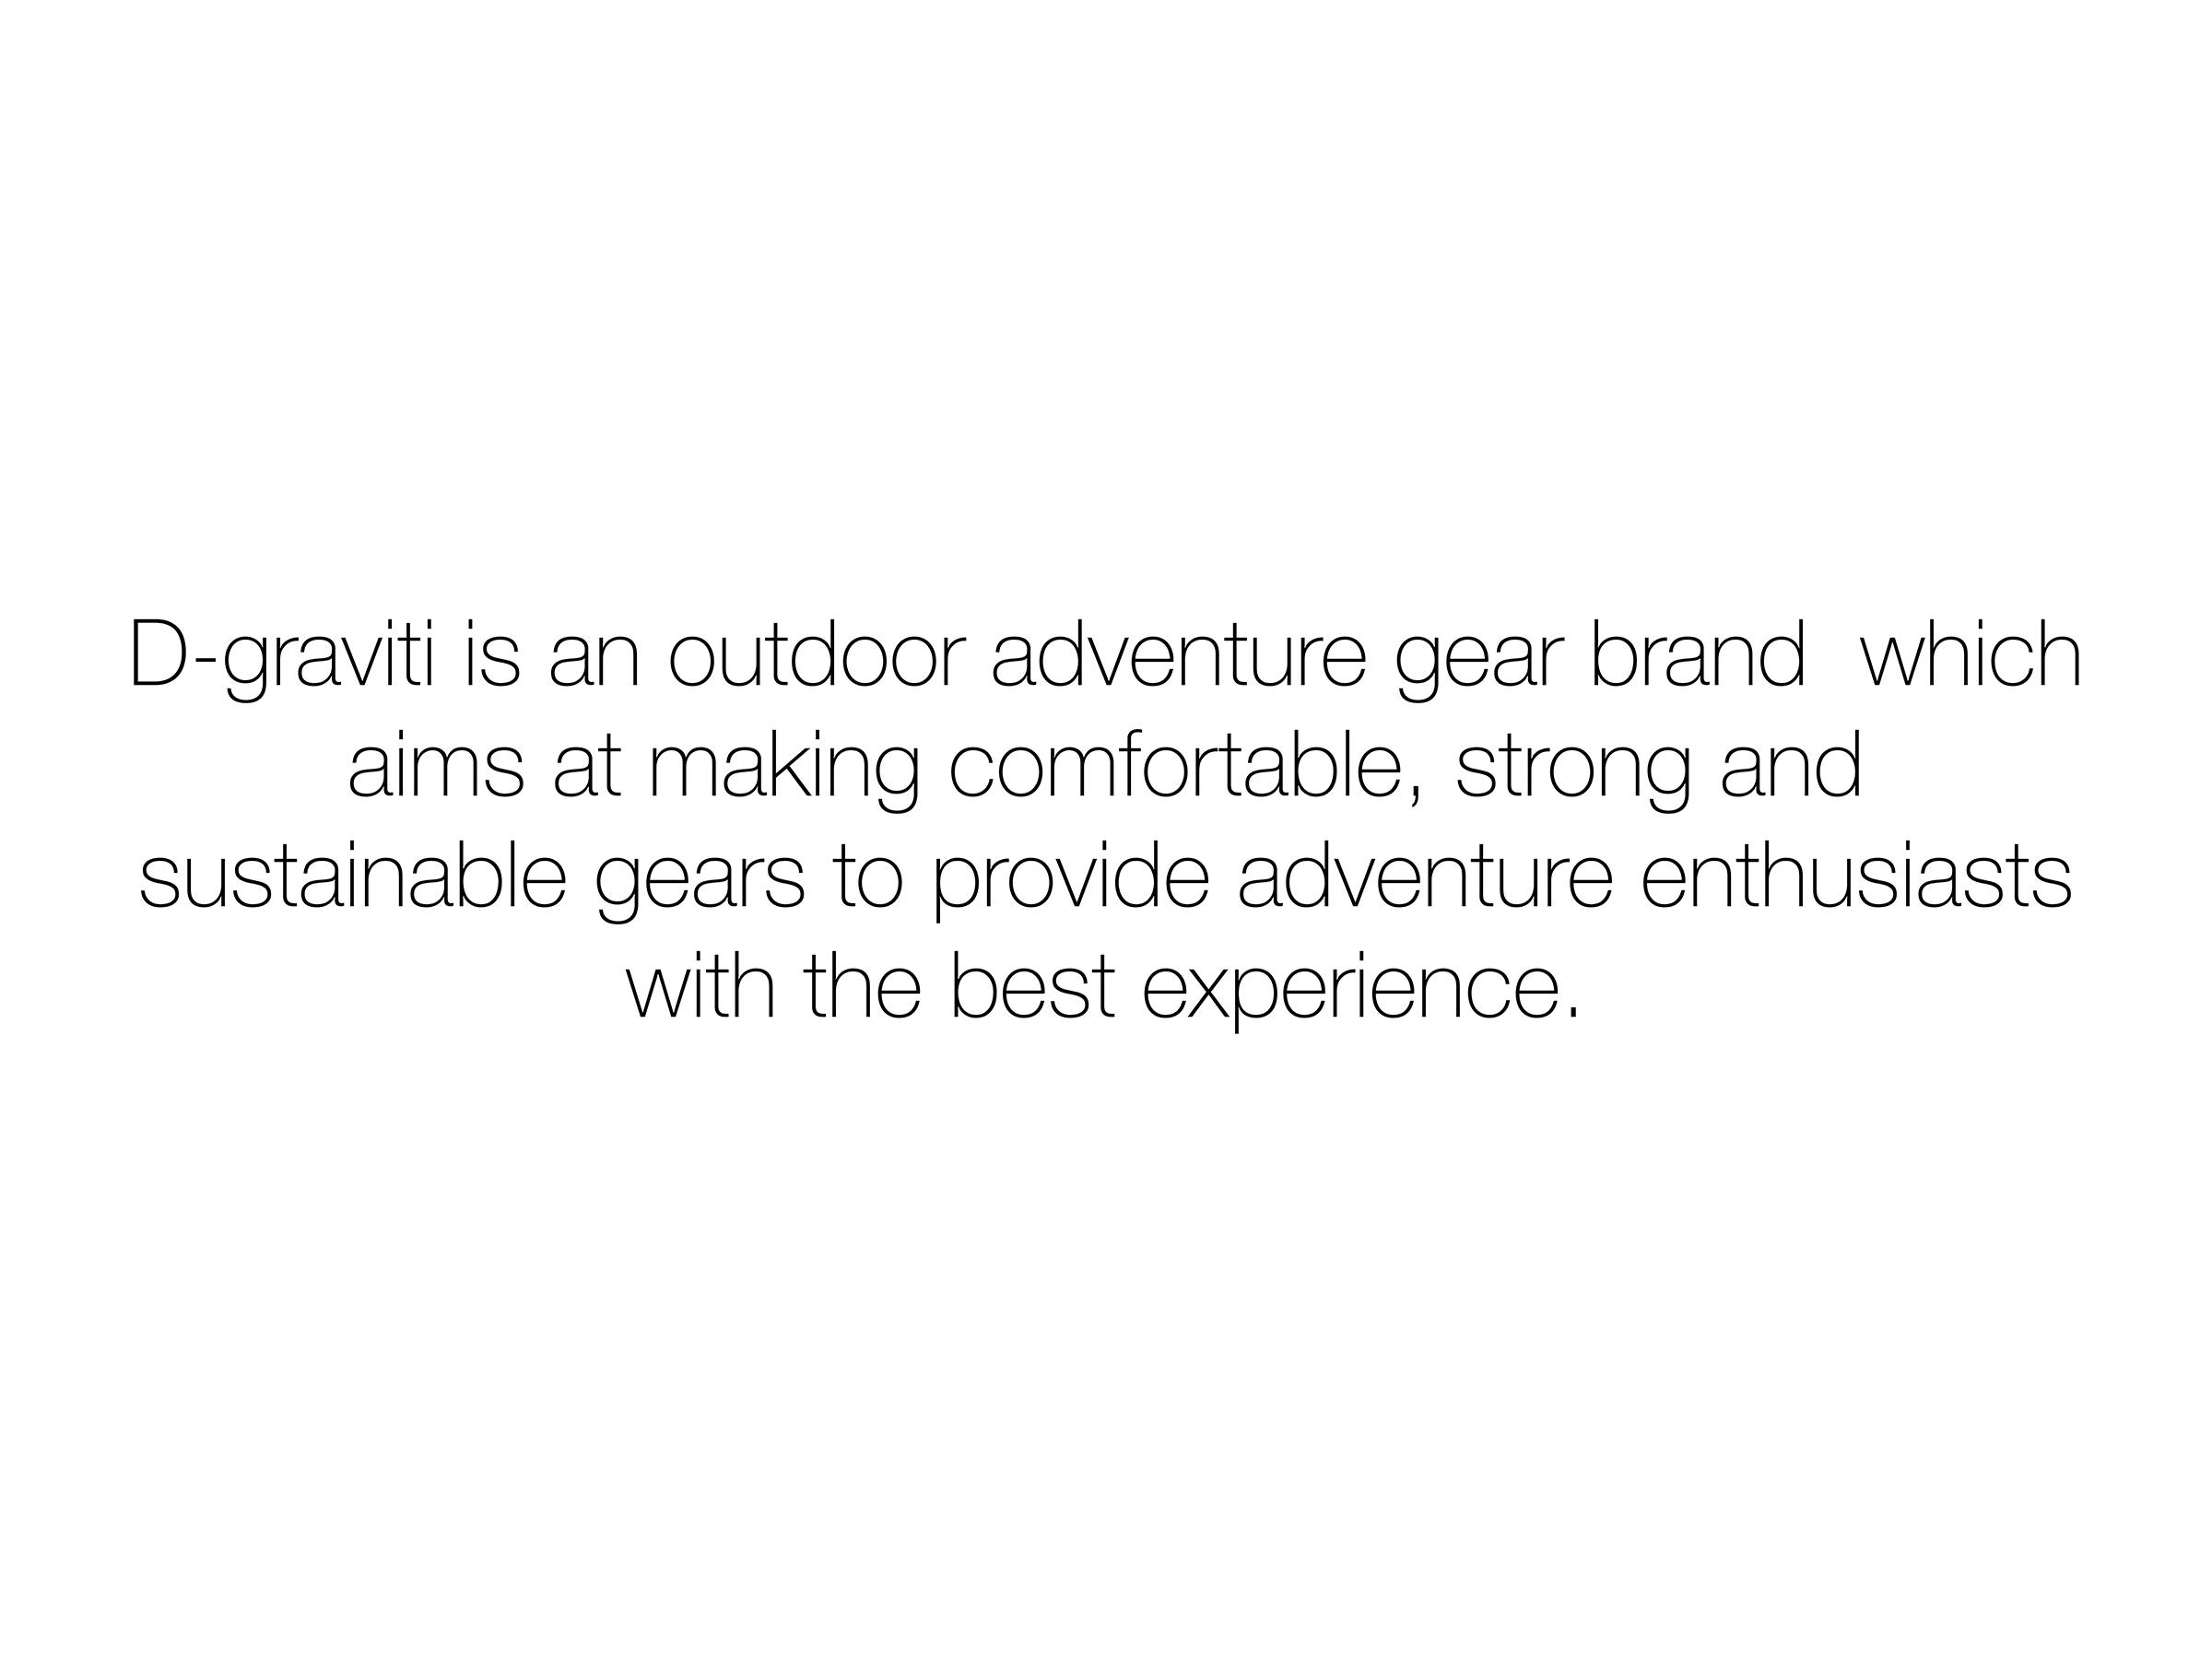 d-graviti marketing TARIKA images_Page_02